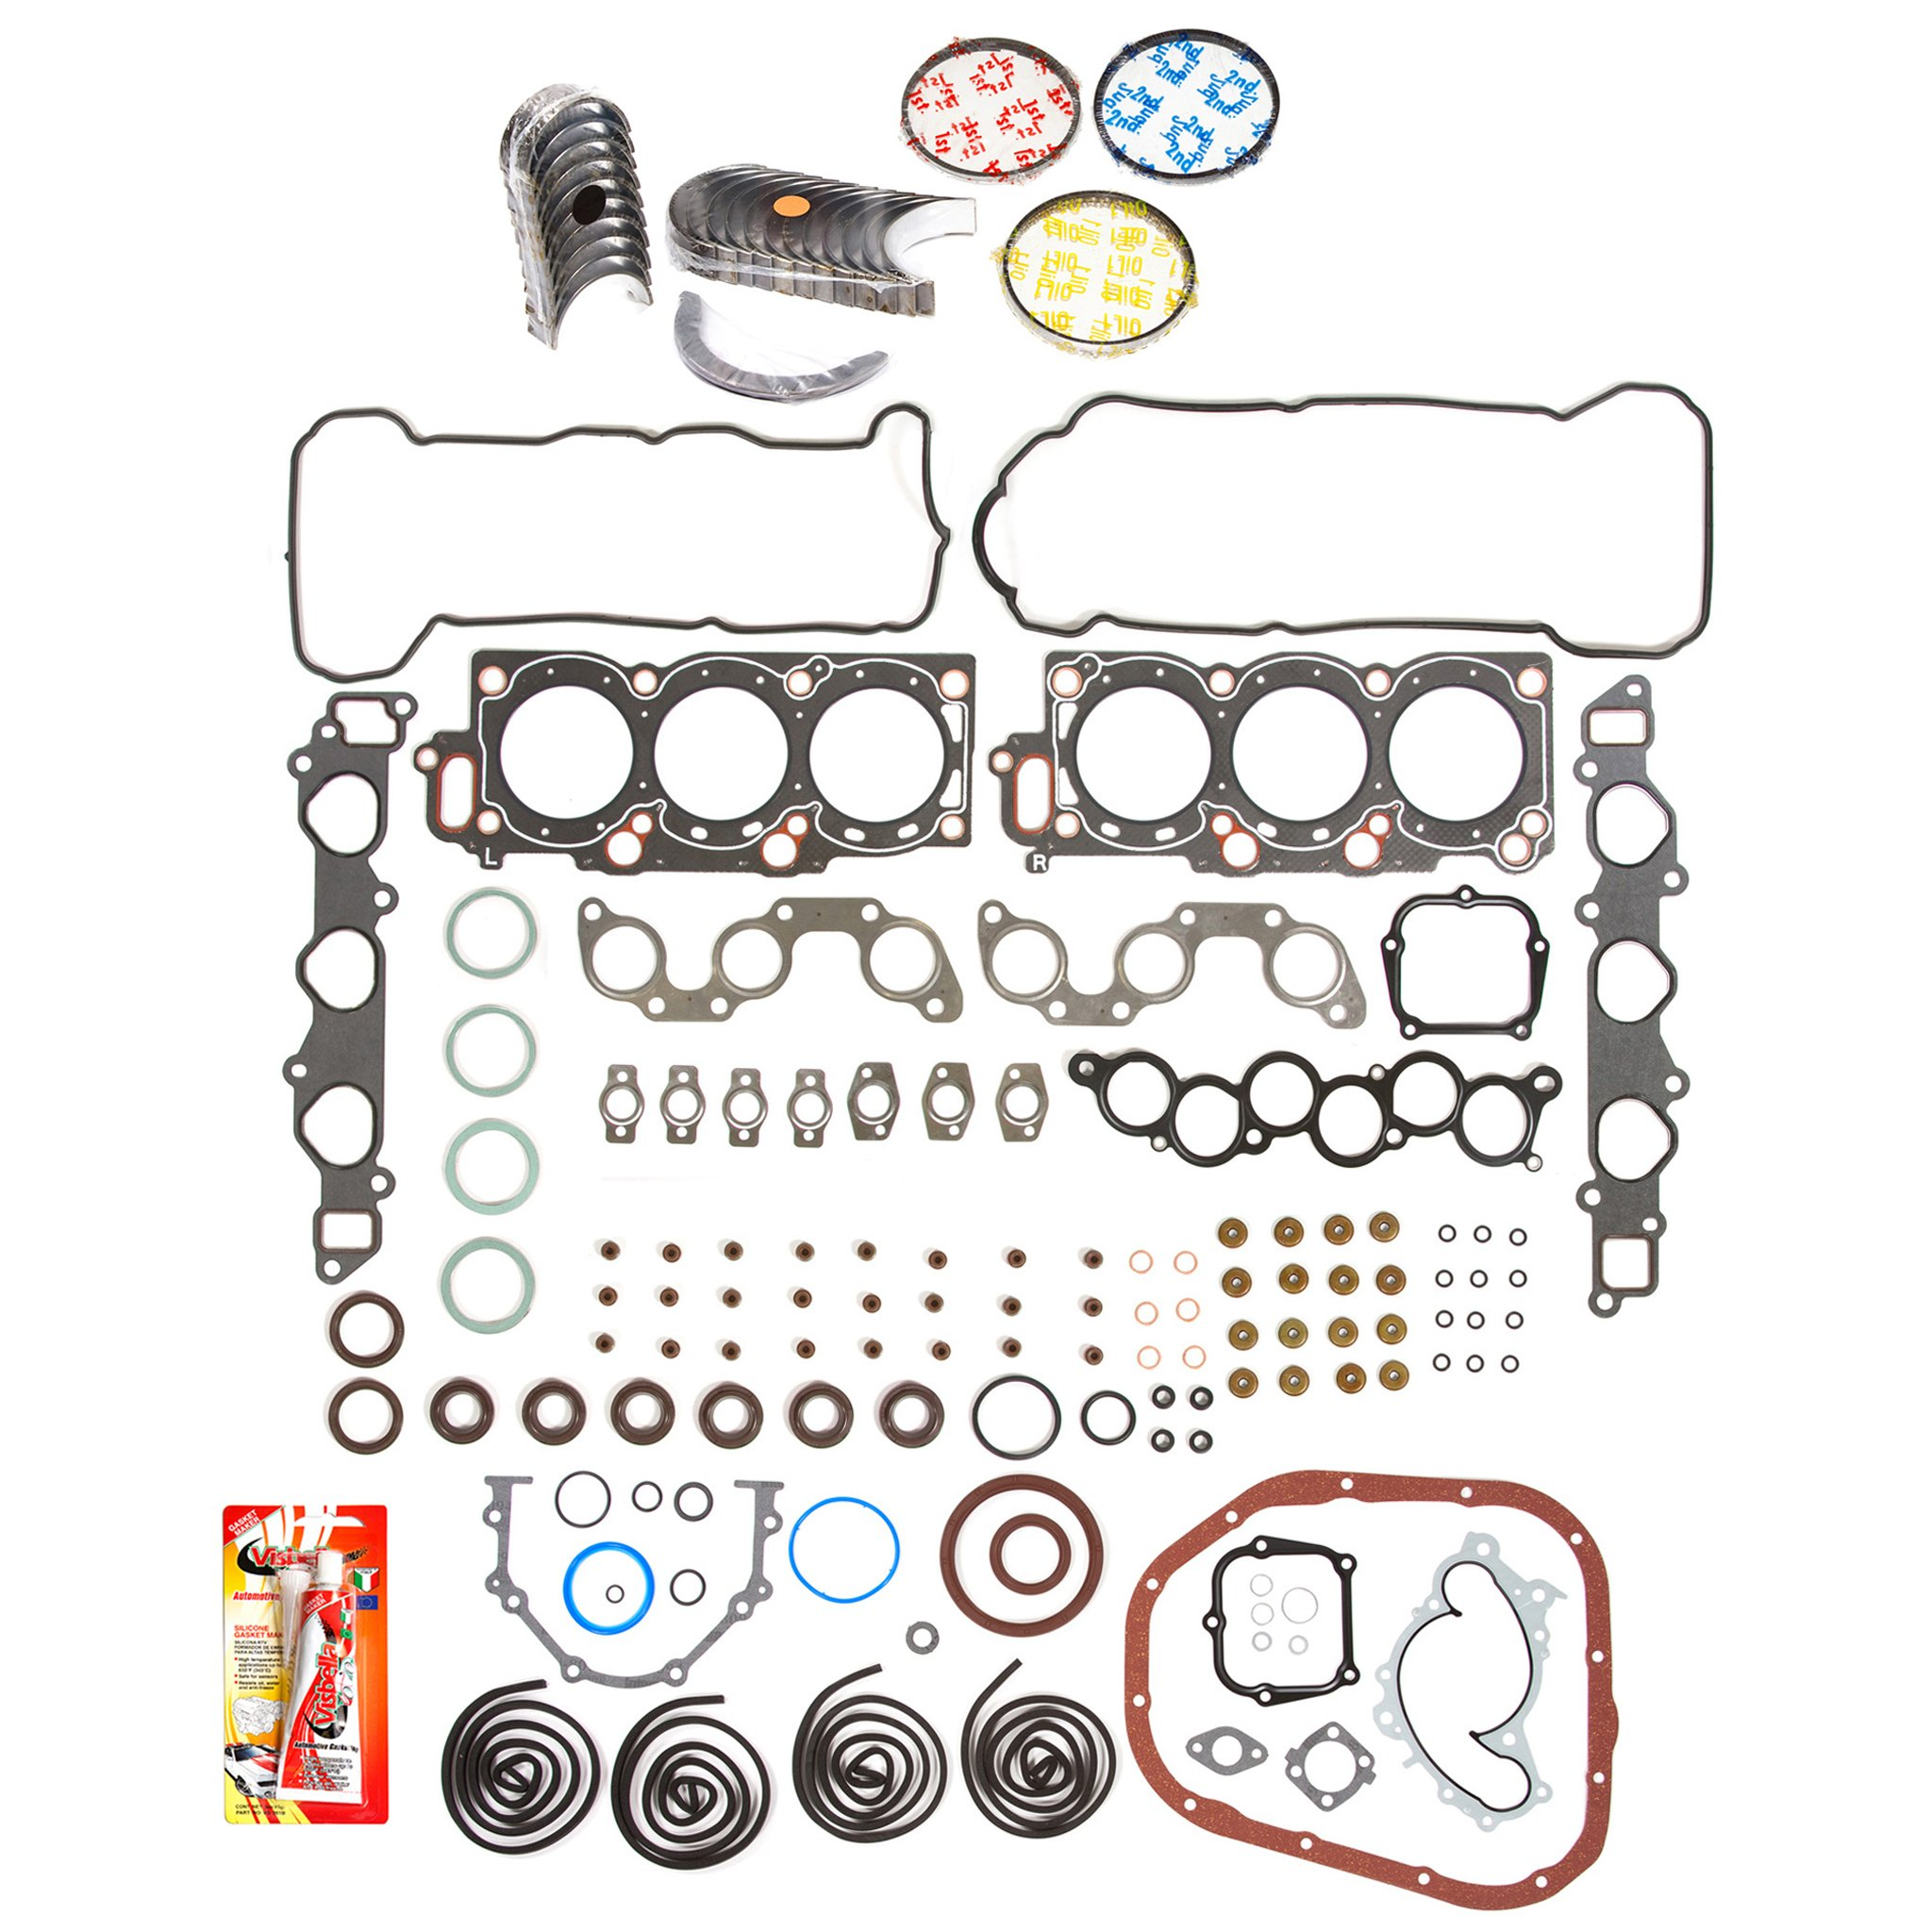 99-04 TOYOTA AVALON HIGHLANDER 3.0L 1MZFE 24V DOHC FULL SET ENGINE *RE-RING KIT*